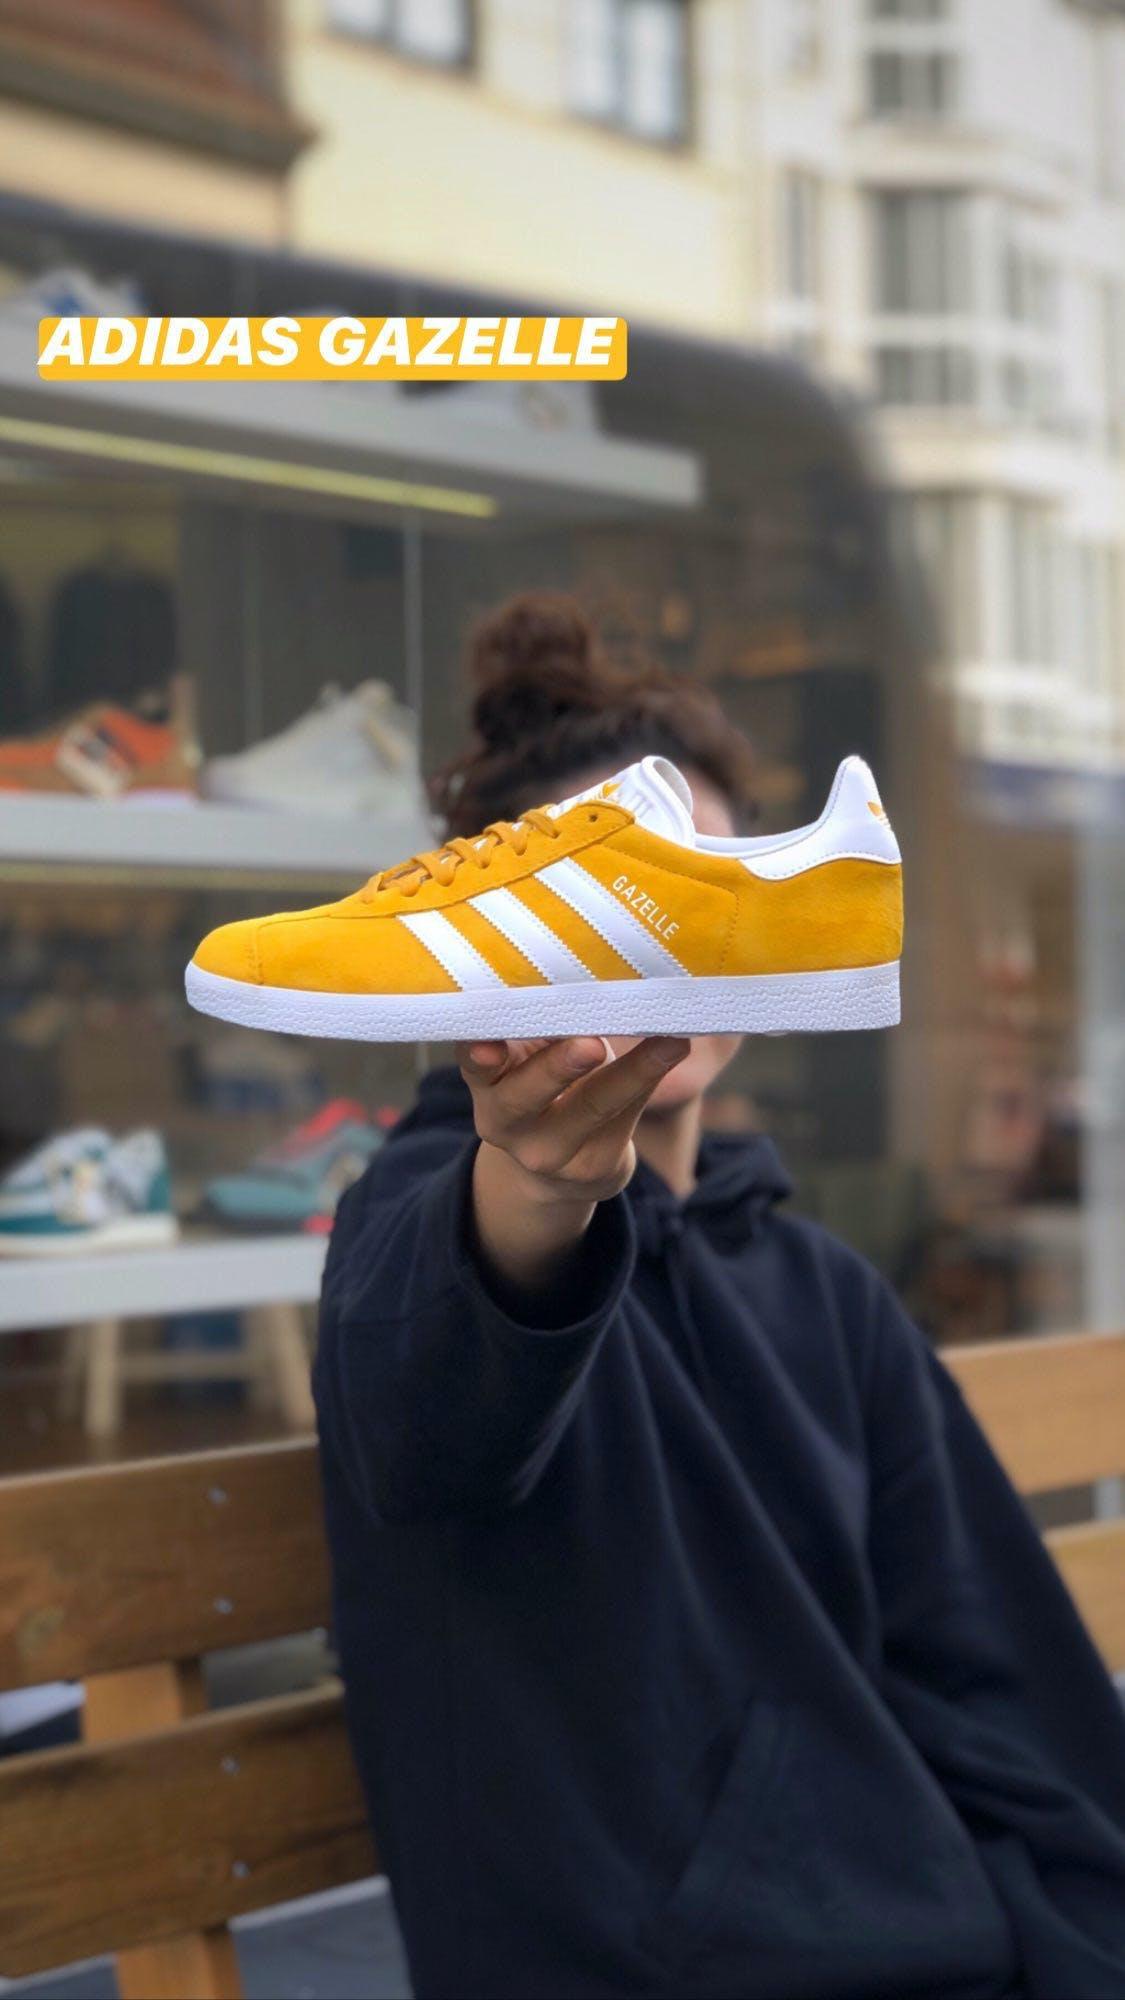 Adidas Gazelle Yellow - Sizerun 36 - 44